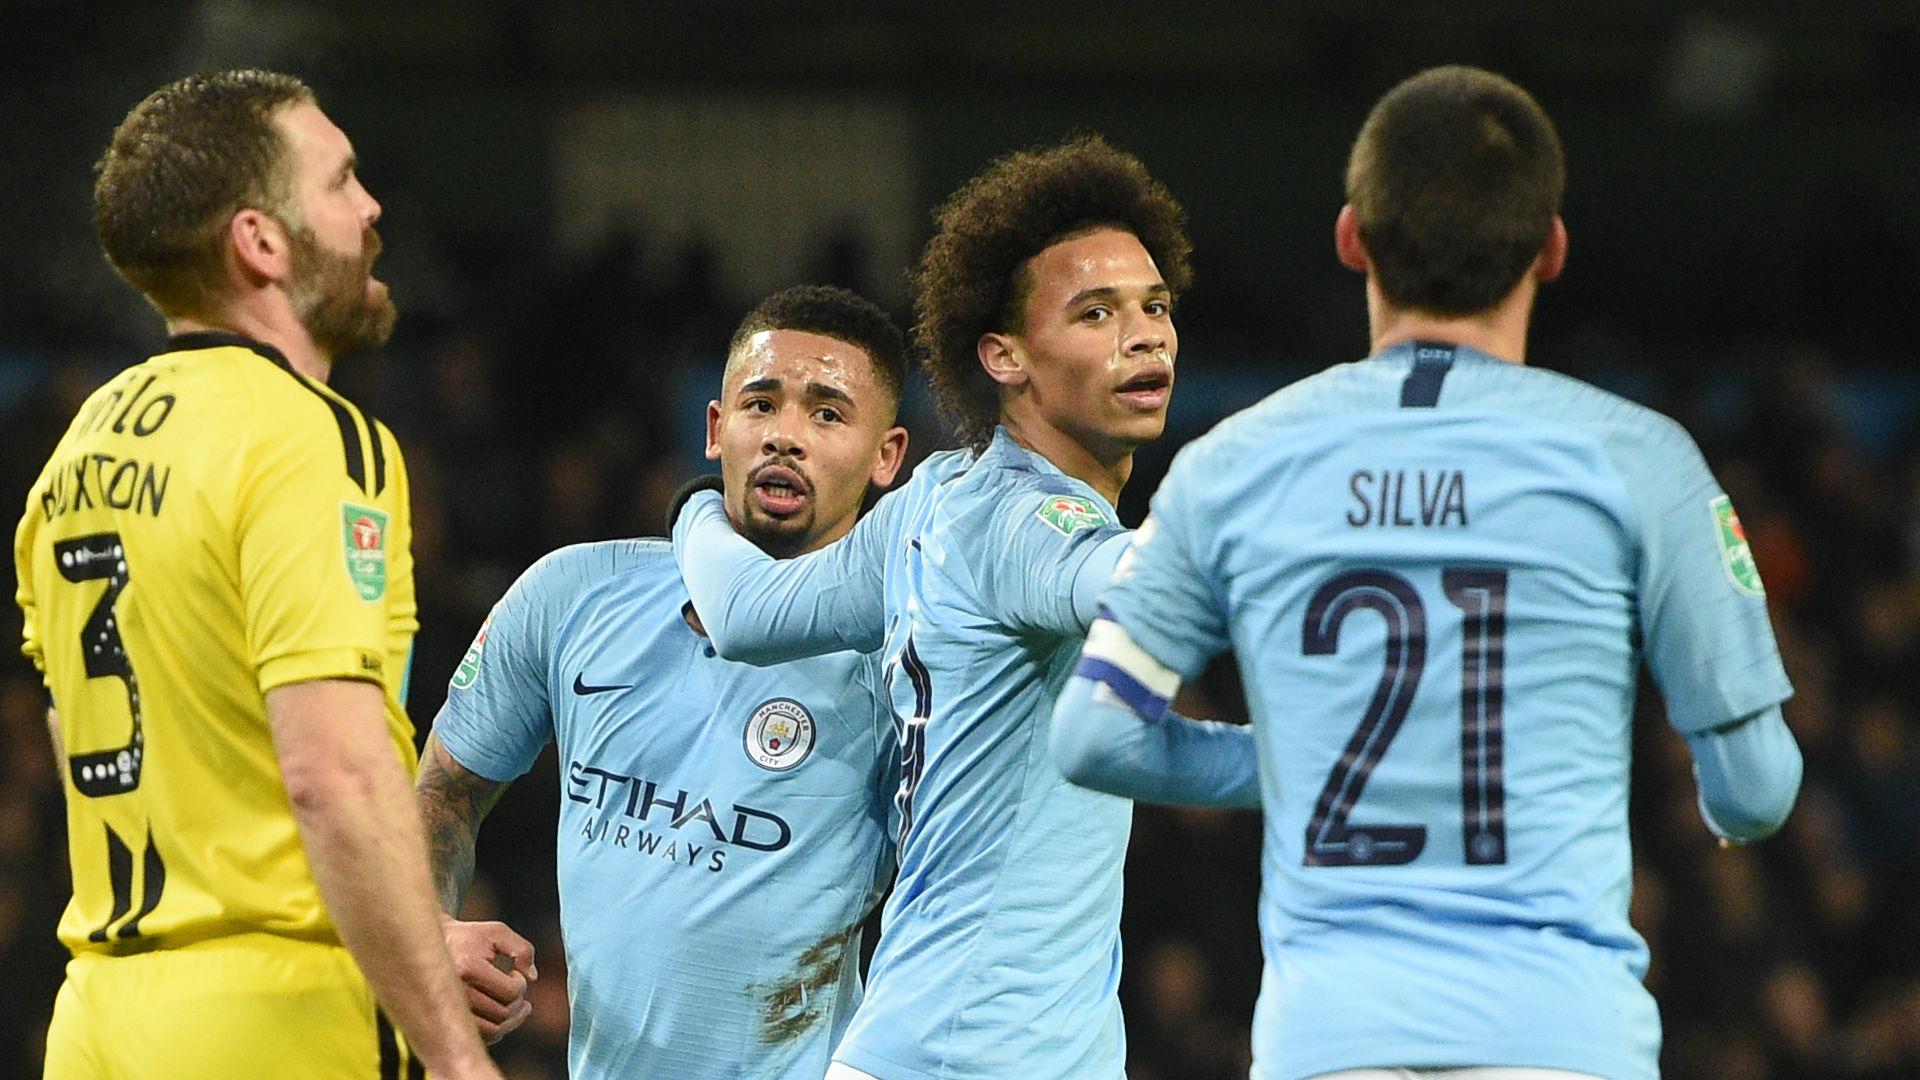 Sane Jesus Burton Manchester City 2018-19